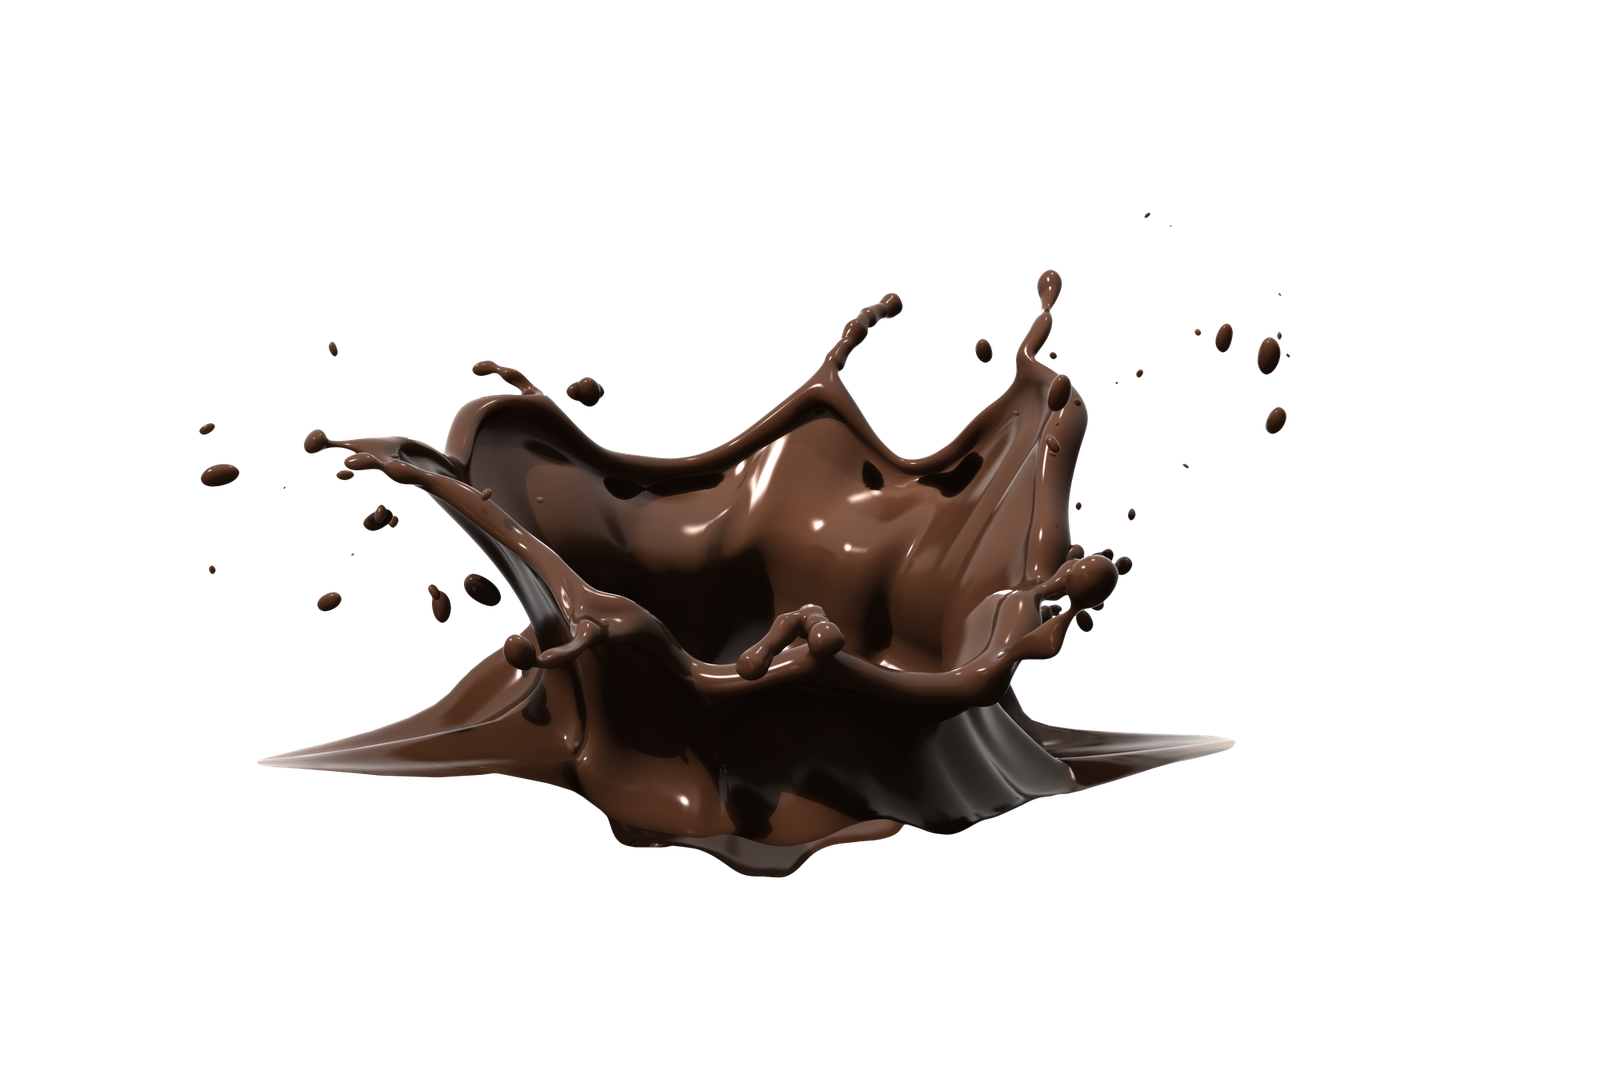 Creamy Caramel Chocolate Model